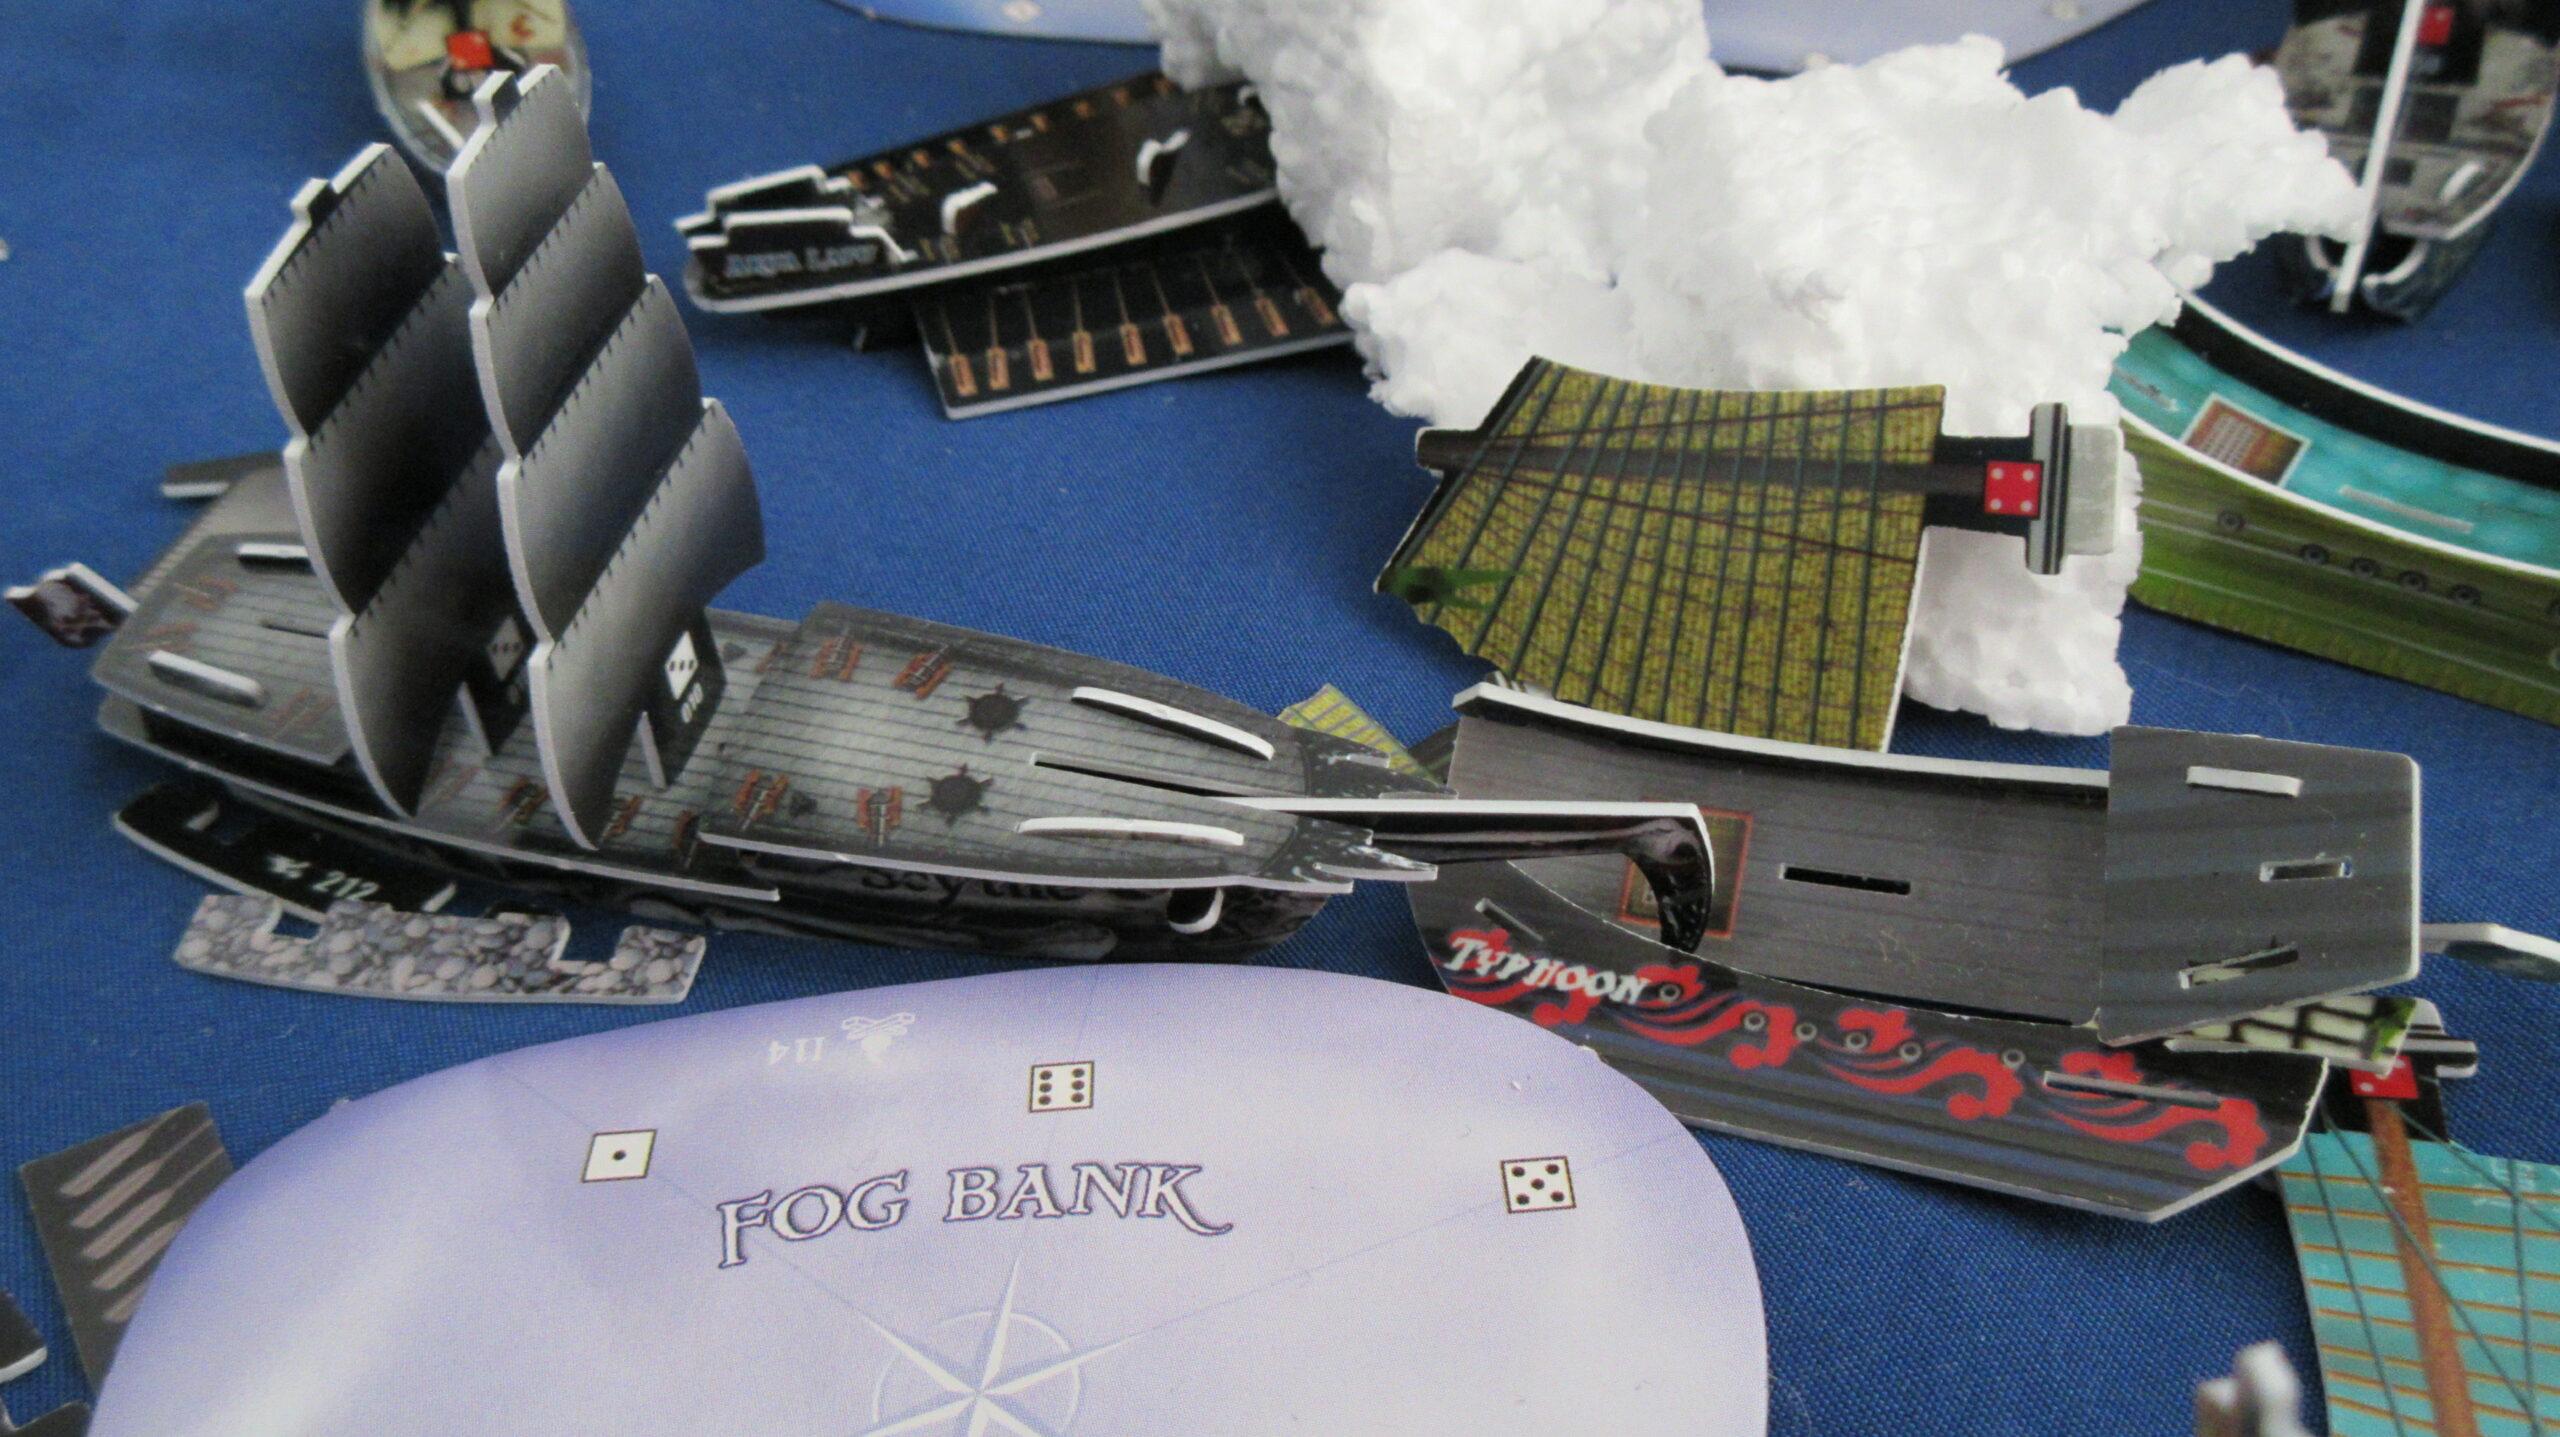 Pirates CSG Scythe crushes and splinters Typhoon